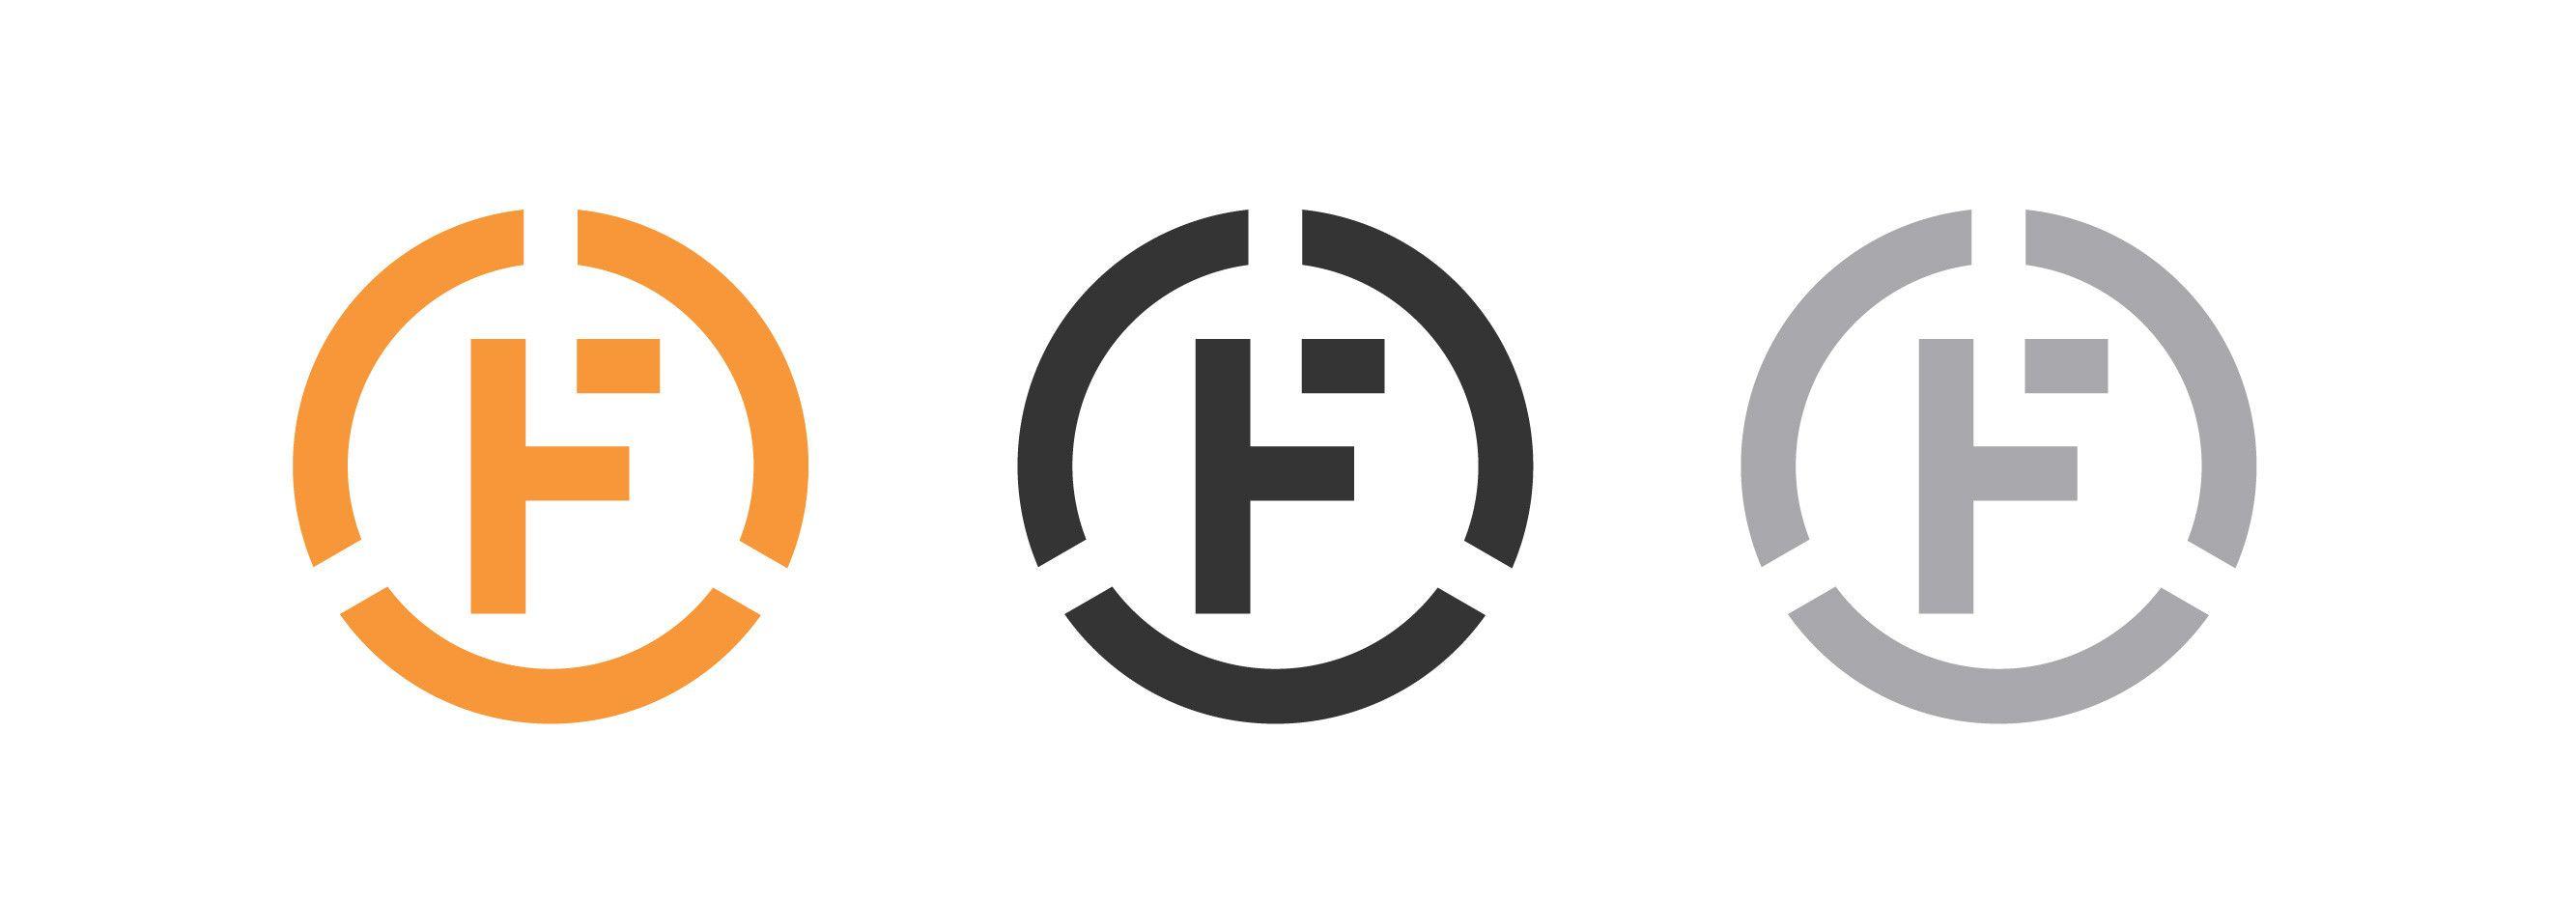 Fanic-BrandGuide-03-03